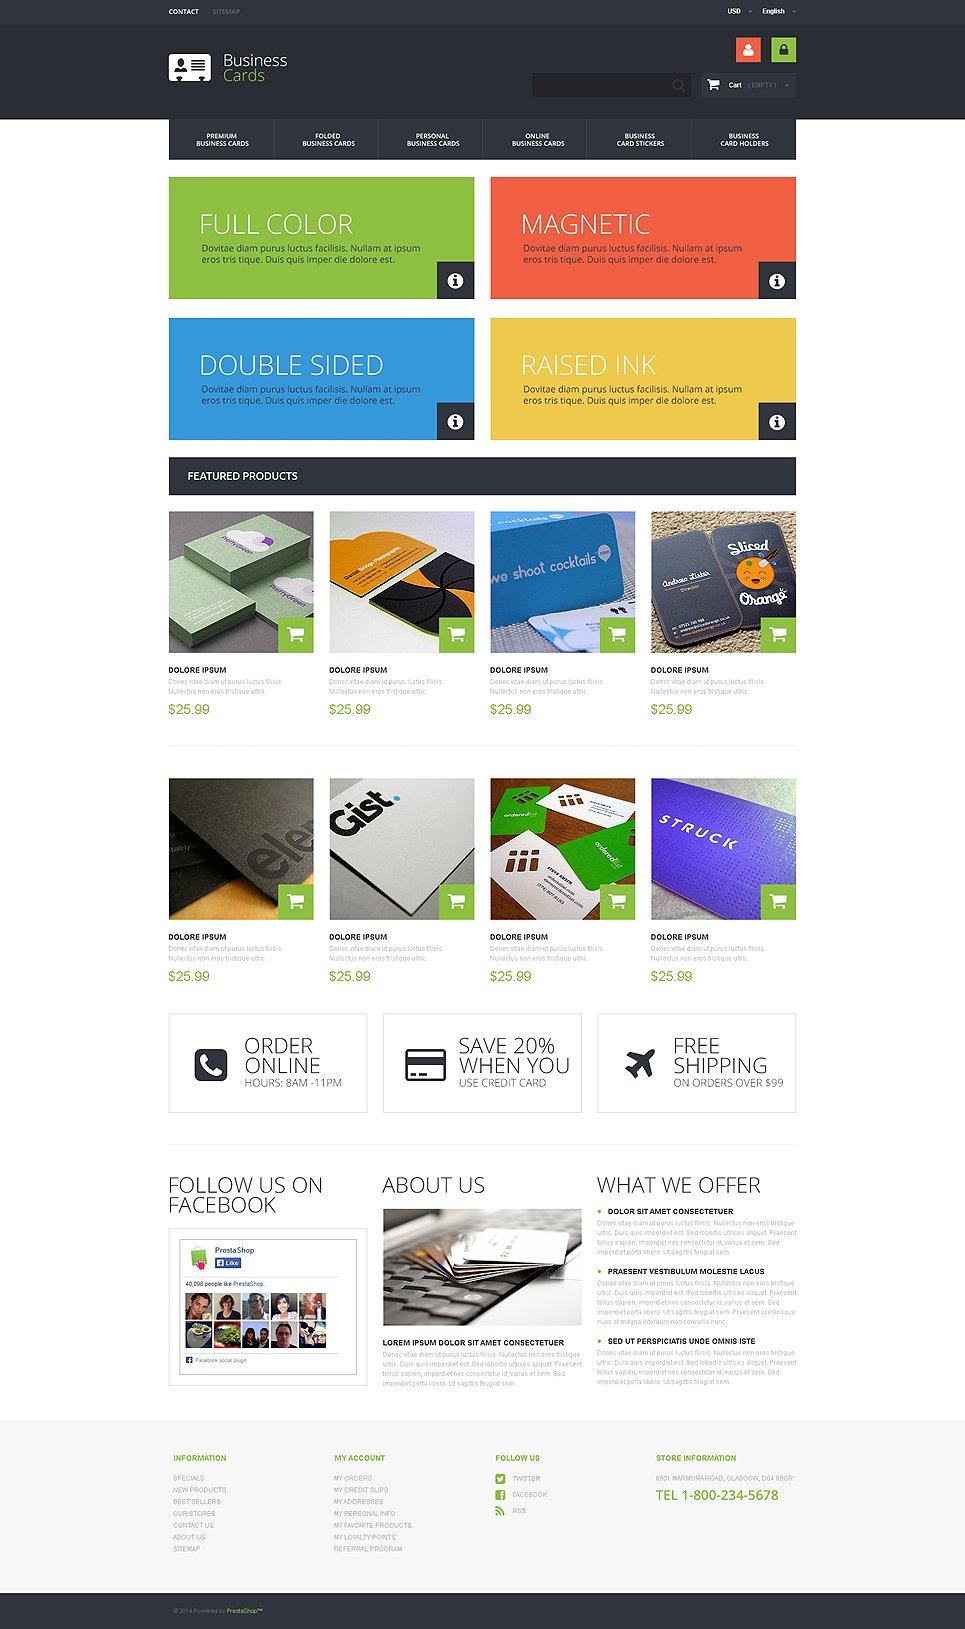 Business Cards Store PrestaShop Theme #49339